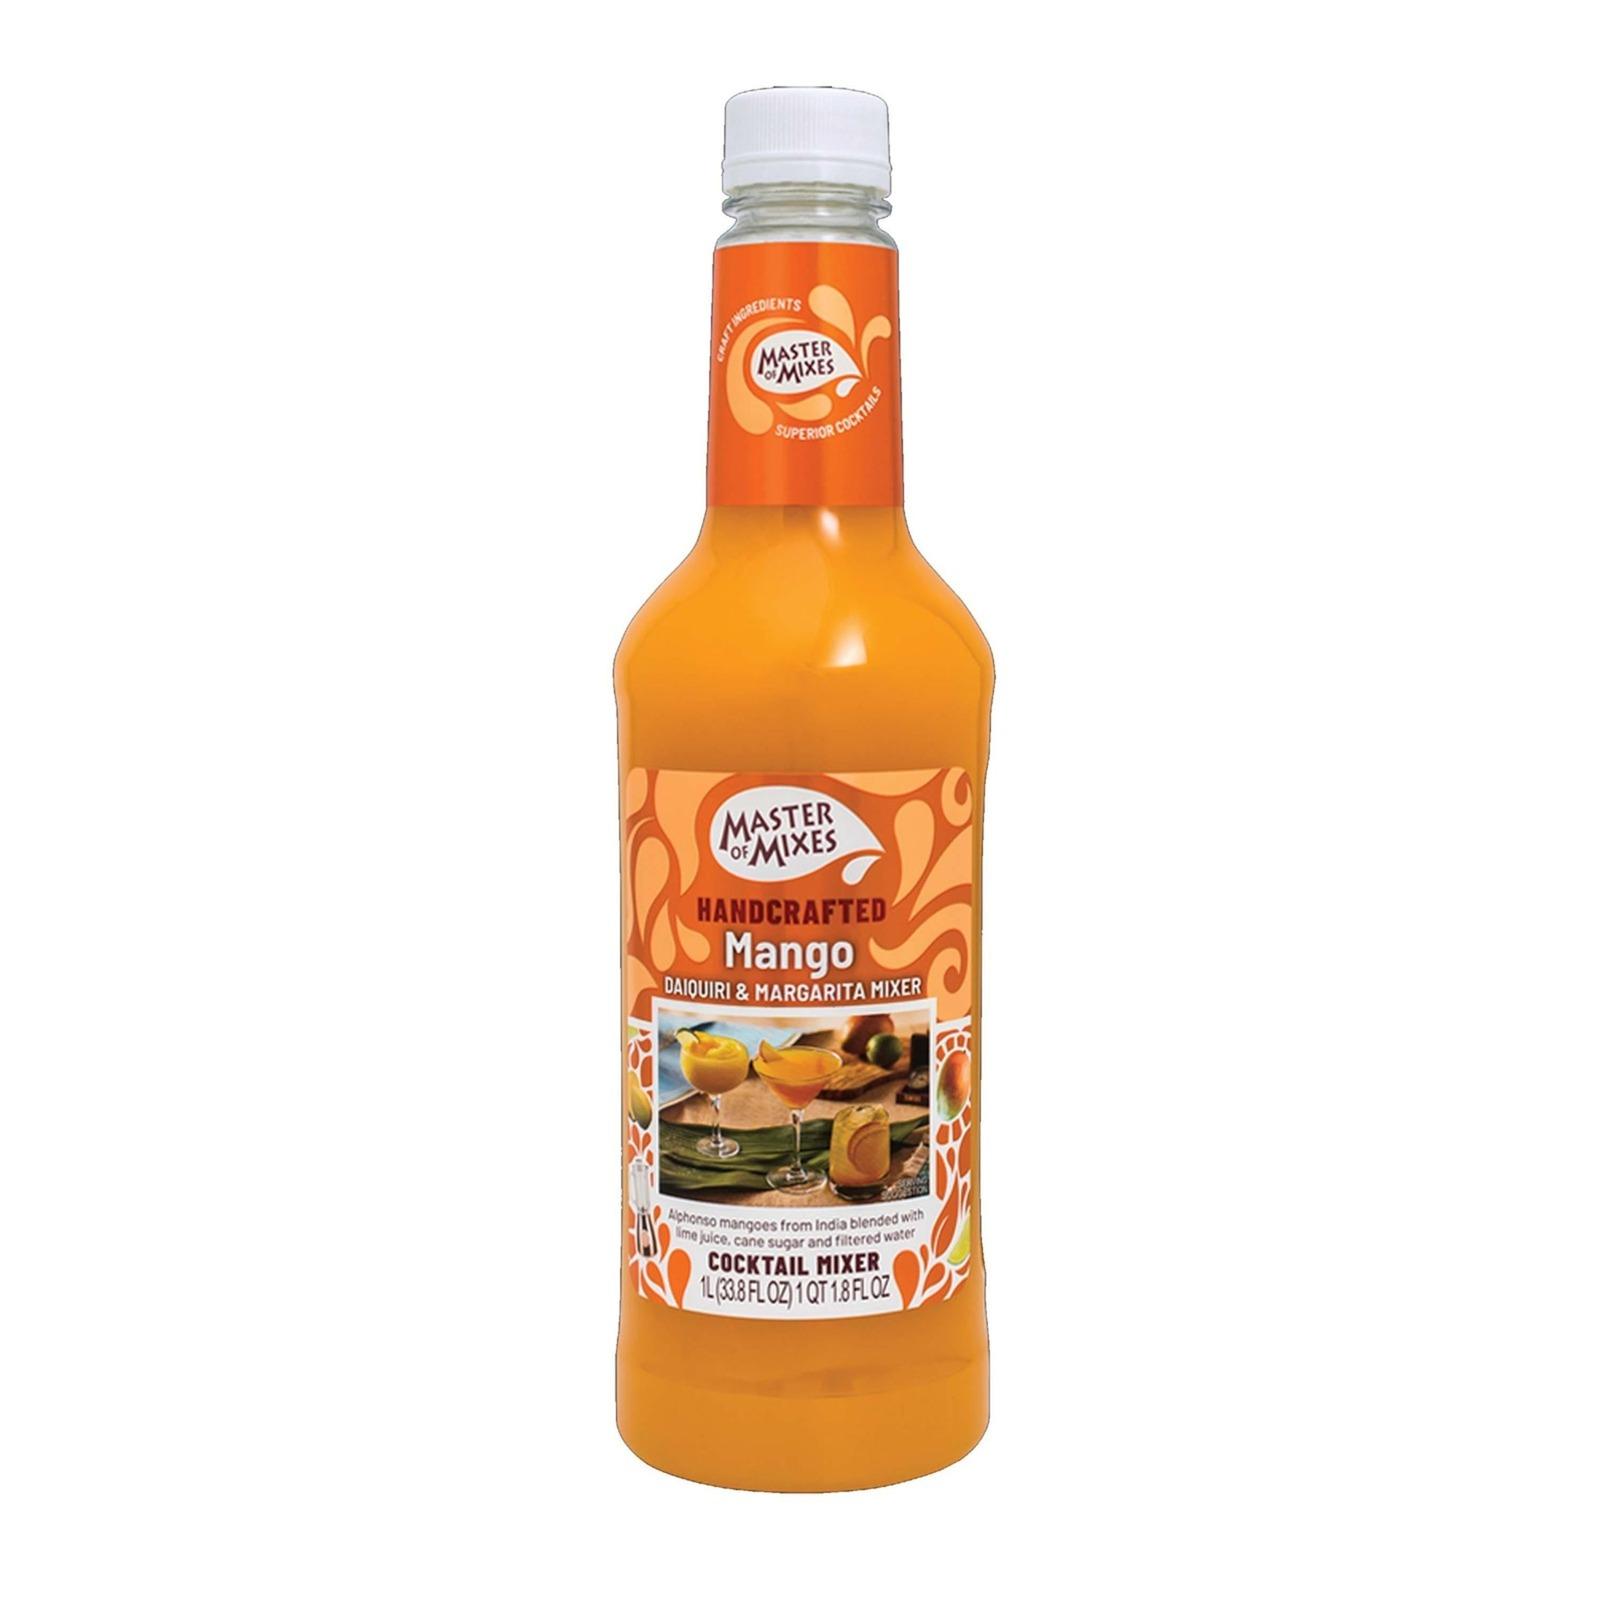 Master of Mixes Mango Daiquiri and Margarita Mixer